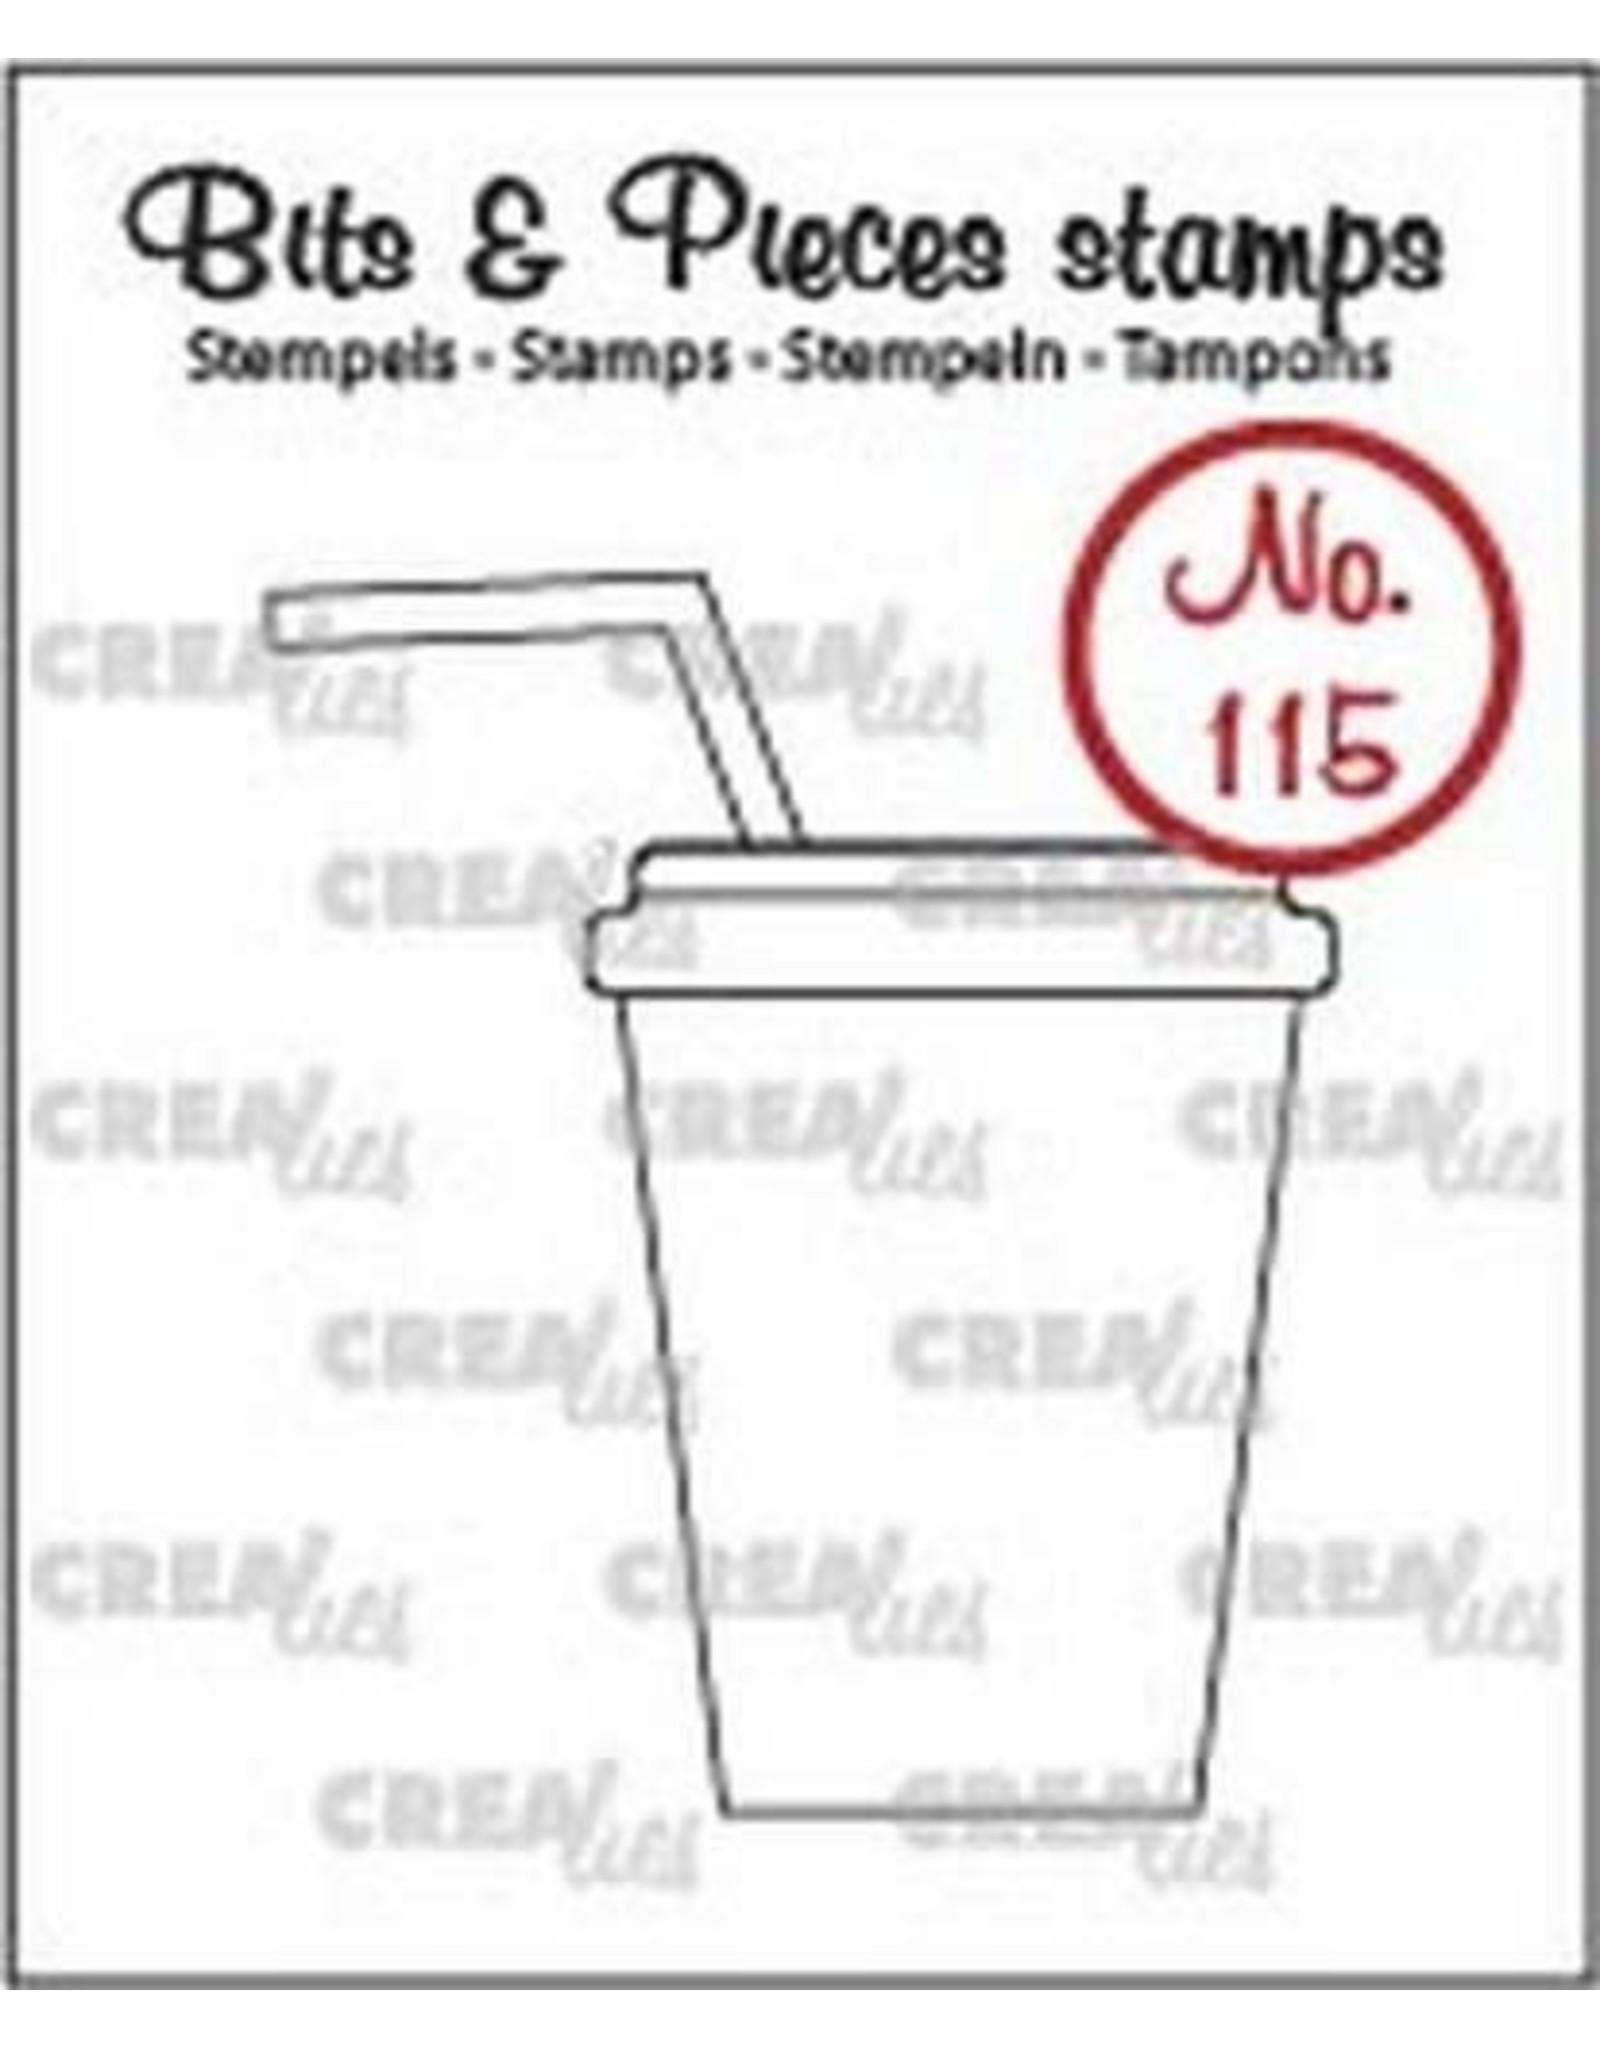 Crealies Clearstamp Bits & Pieces no. 115 softdrink/milksh. CLBP115 / 37x43mm